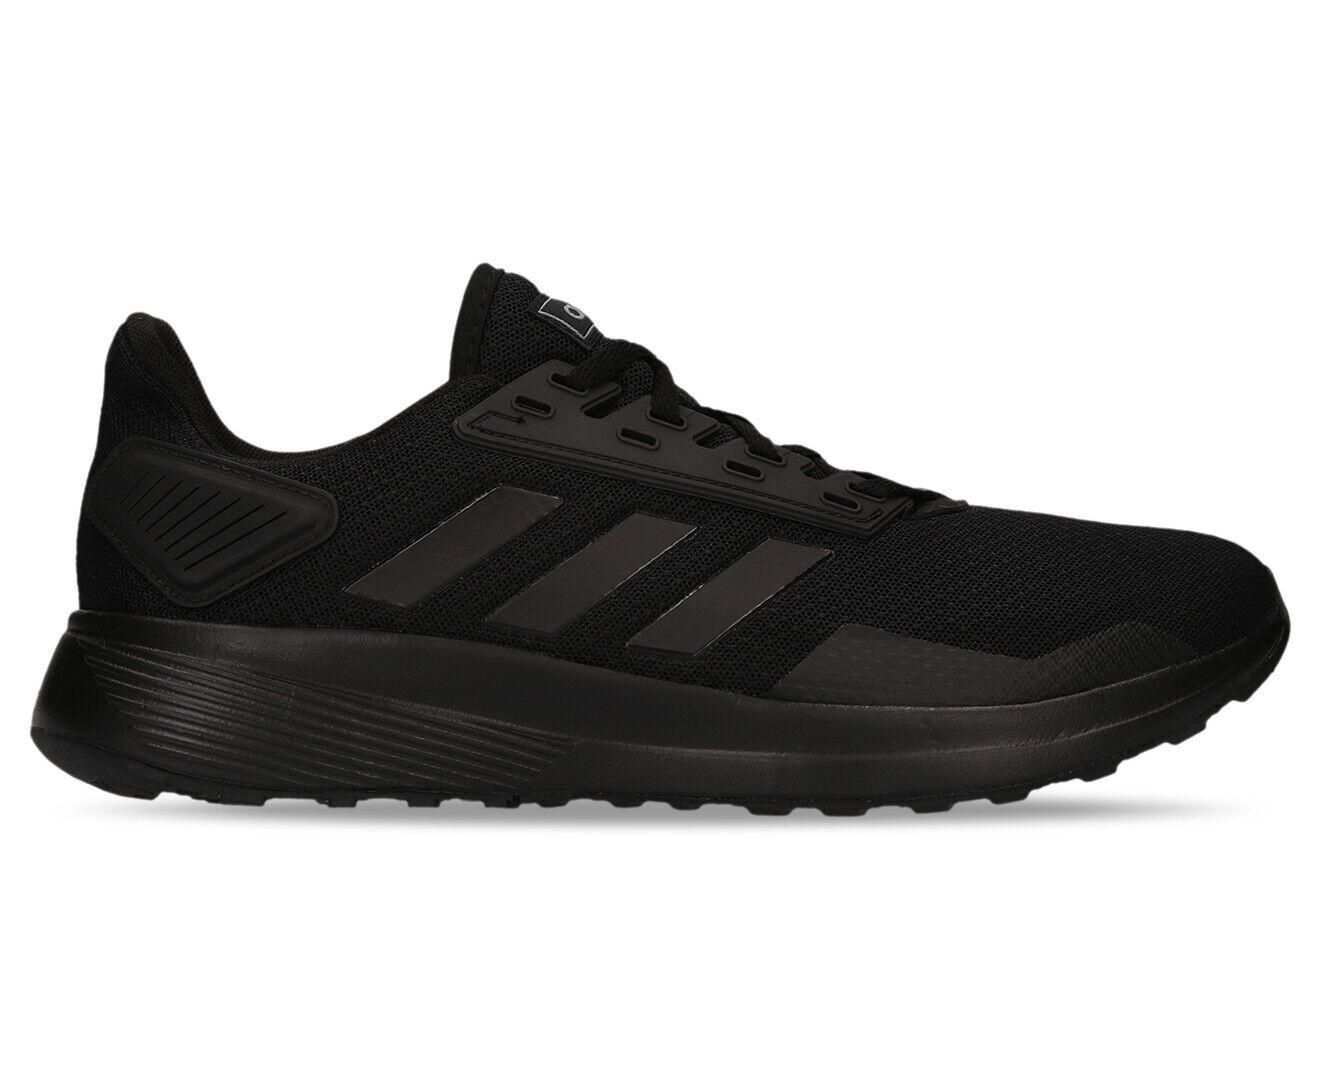 Adidas Breeze M Running Shoes